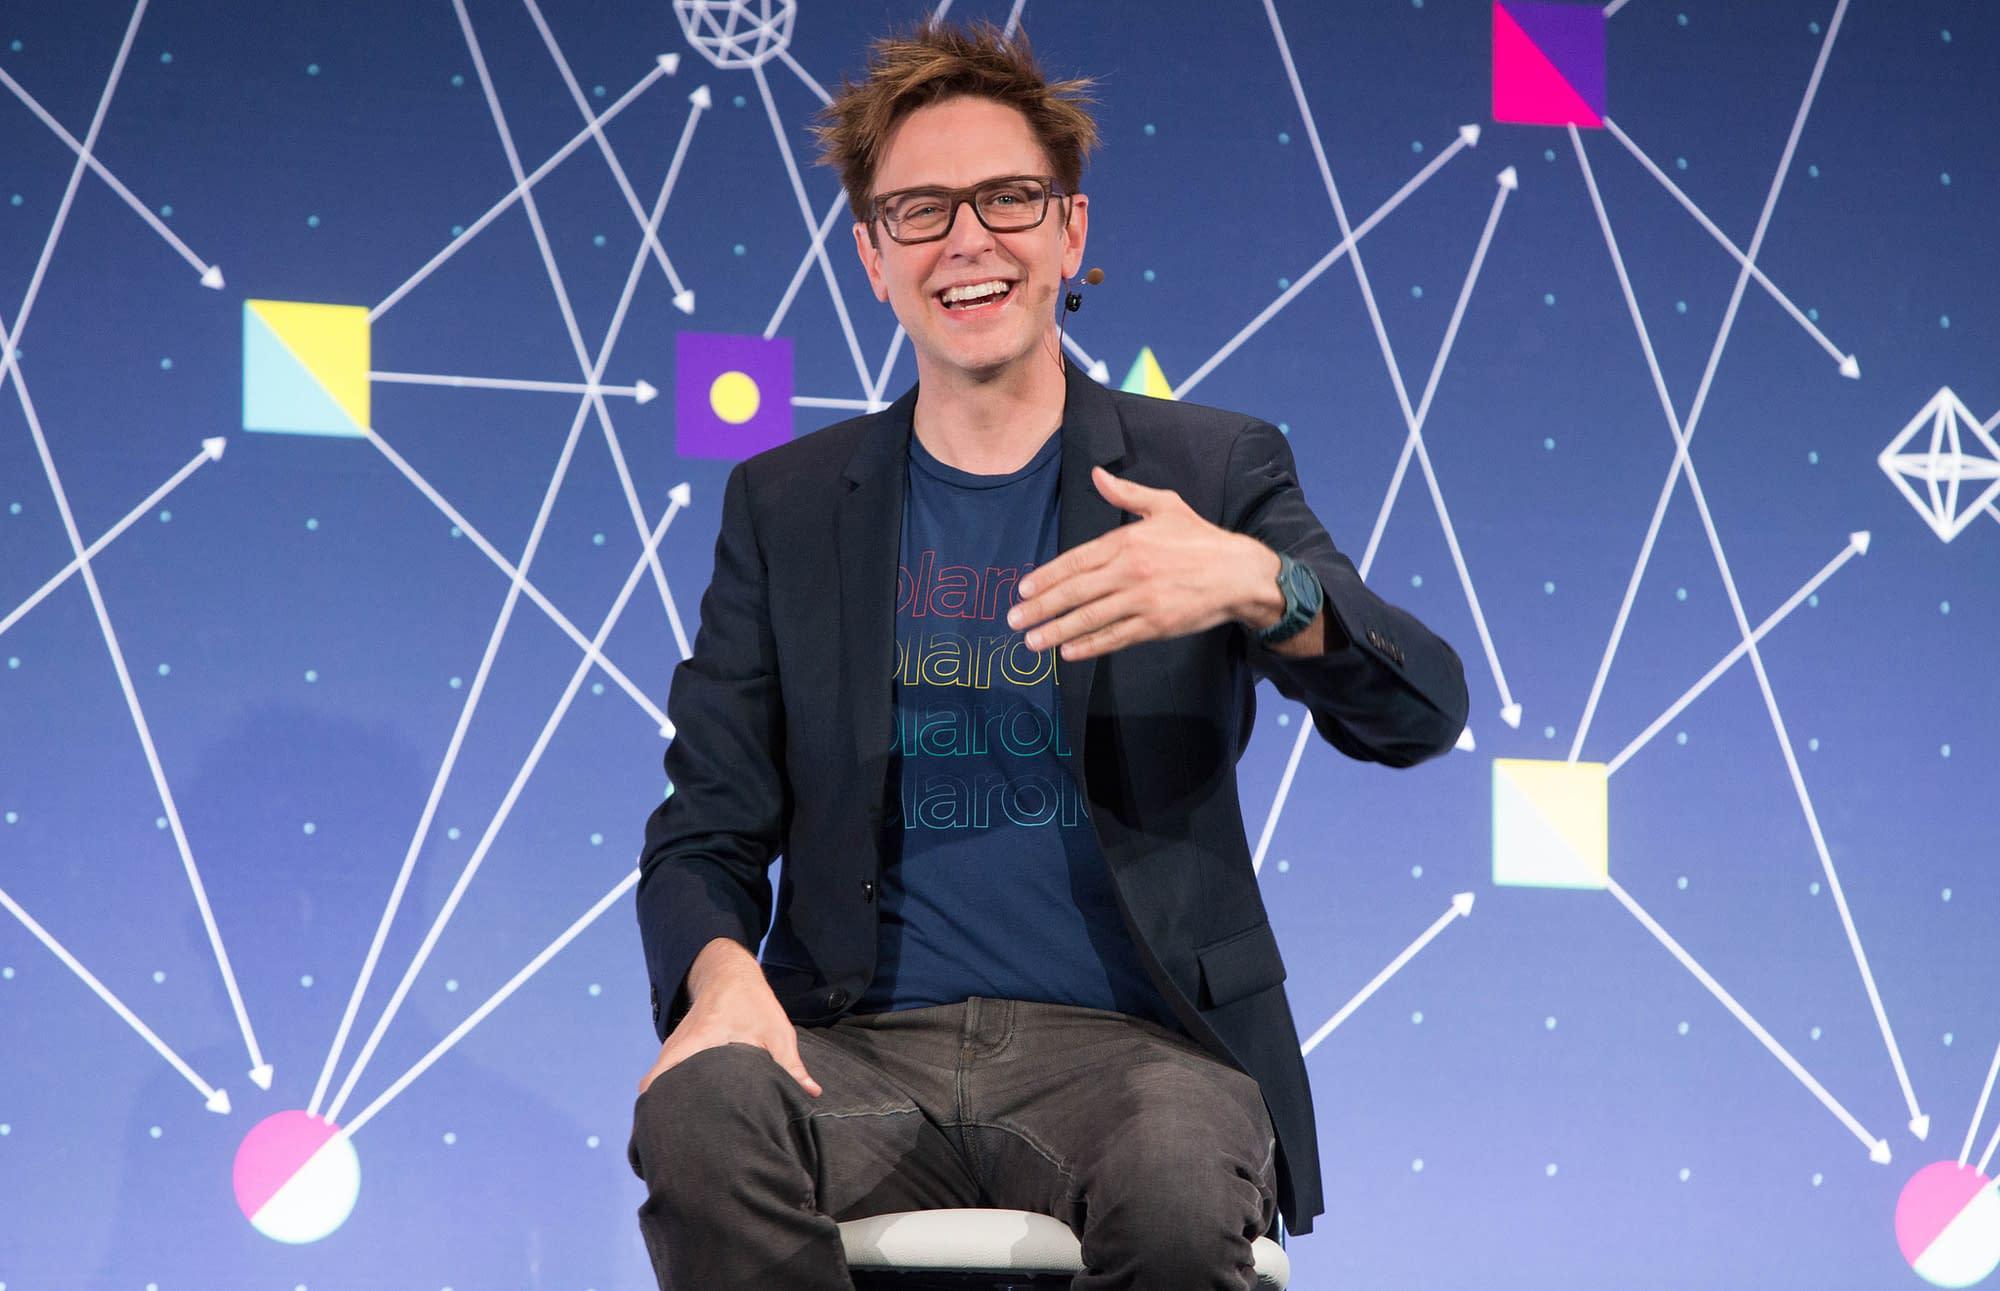 Sources Say Warner Bros. Wants James Gunn Post-Disney Exit